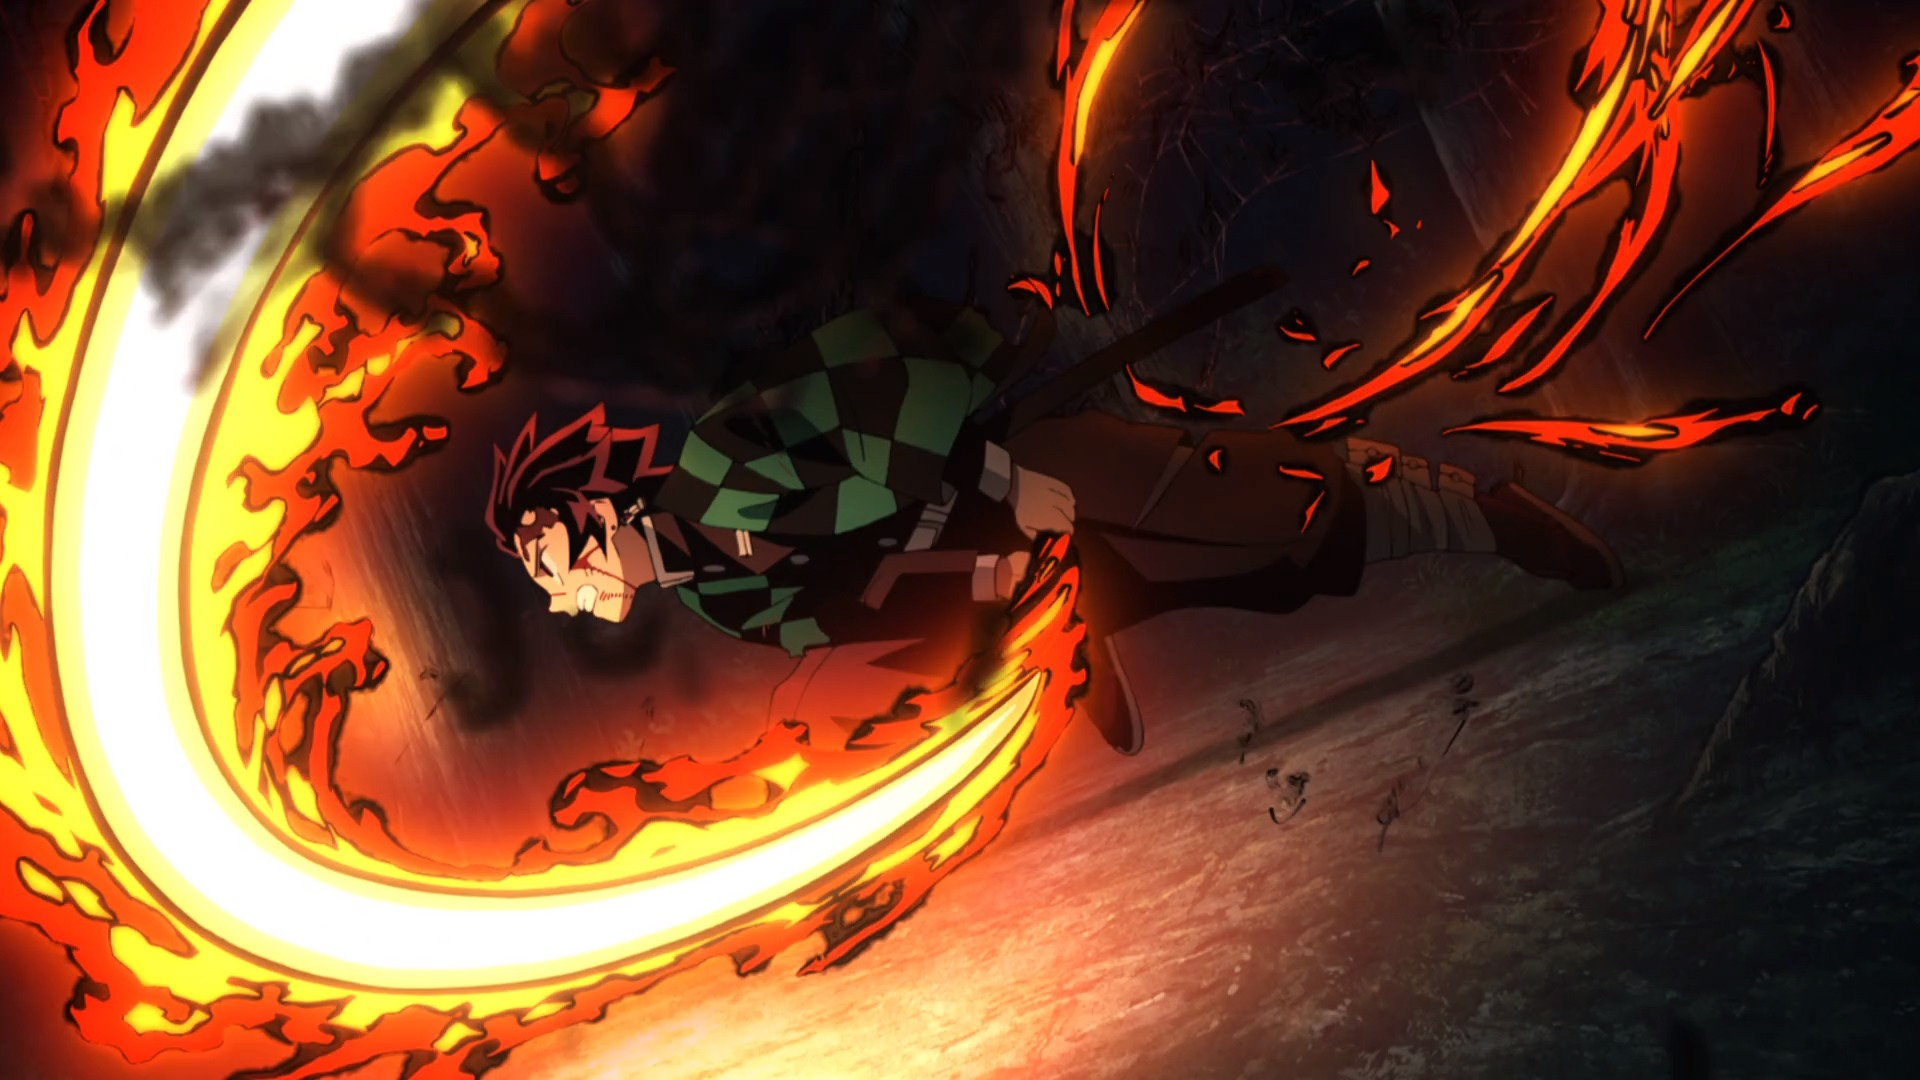 Demon Slayer Kimetsu No Yaiba Episodes 18 19 Anime Review